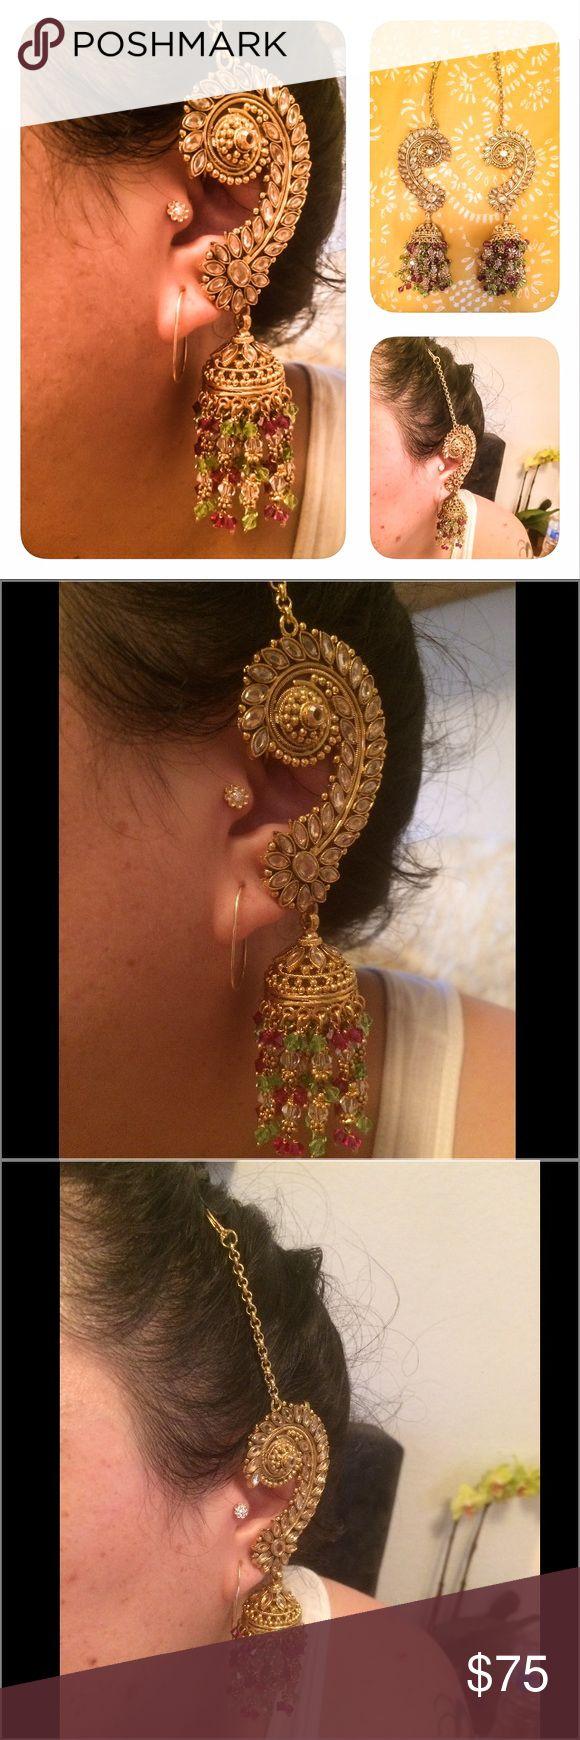 Gorgeous Indian Ear Cuff Statement Earrings